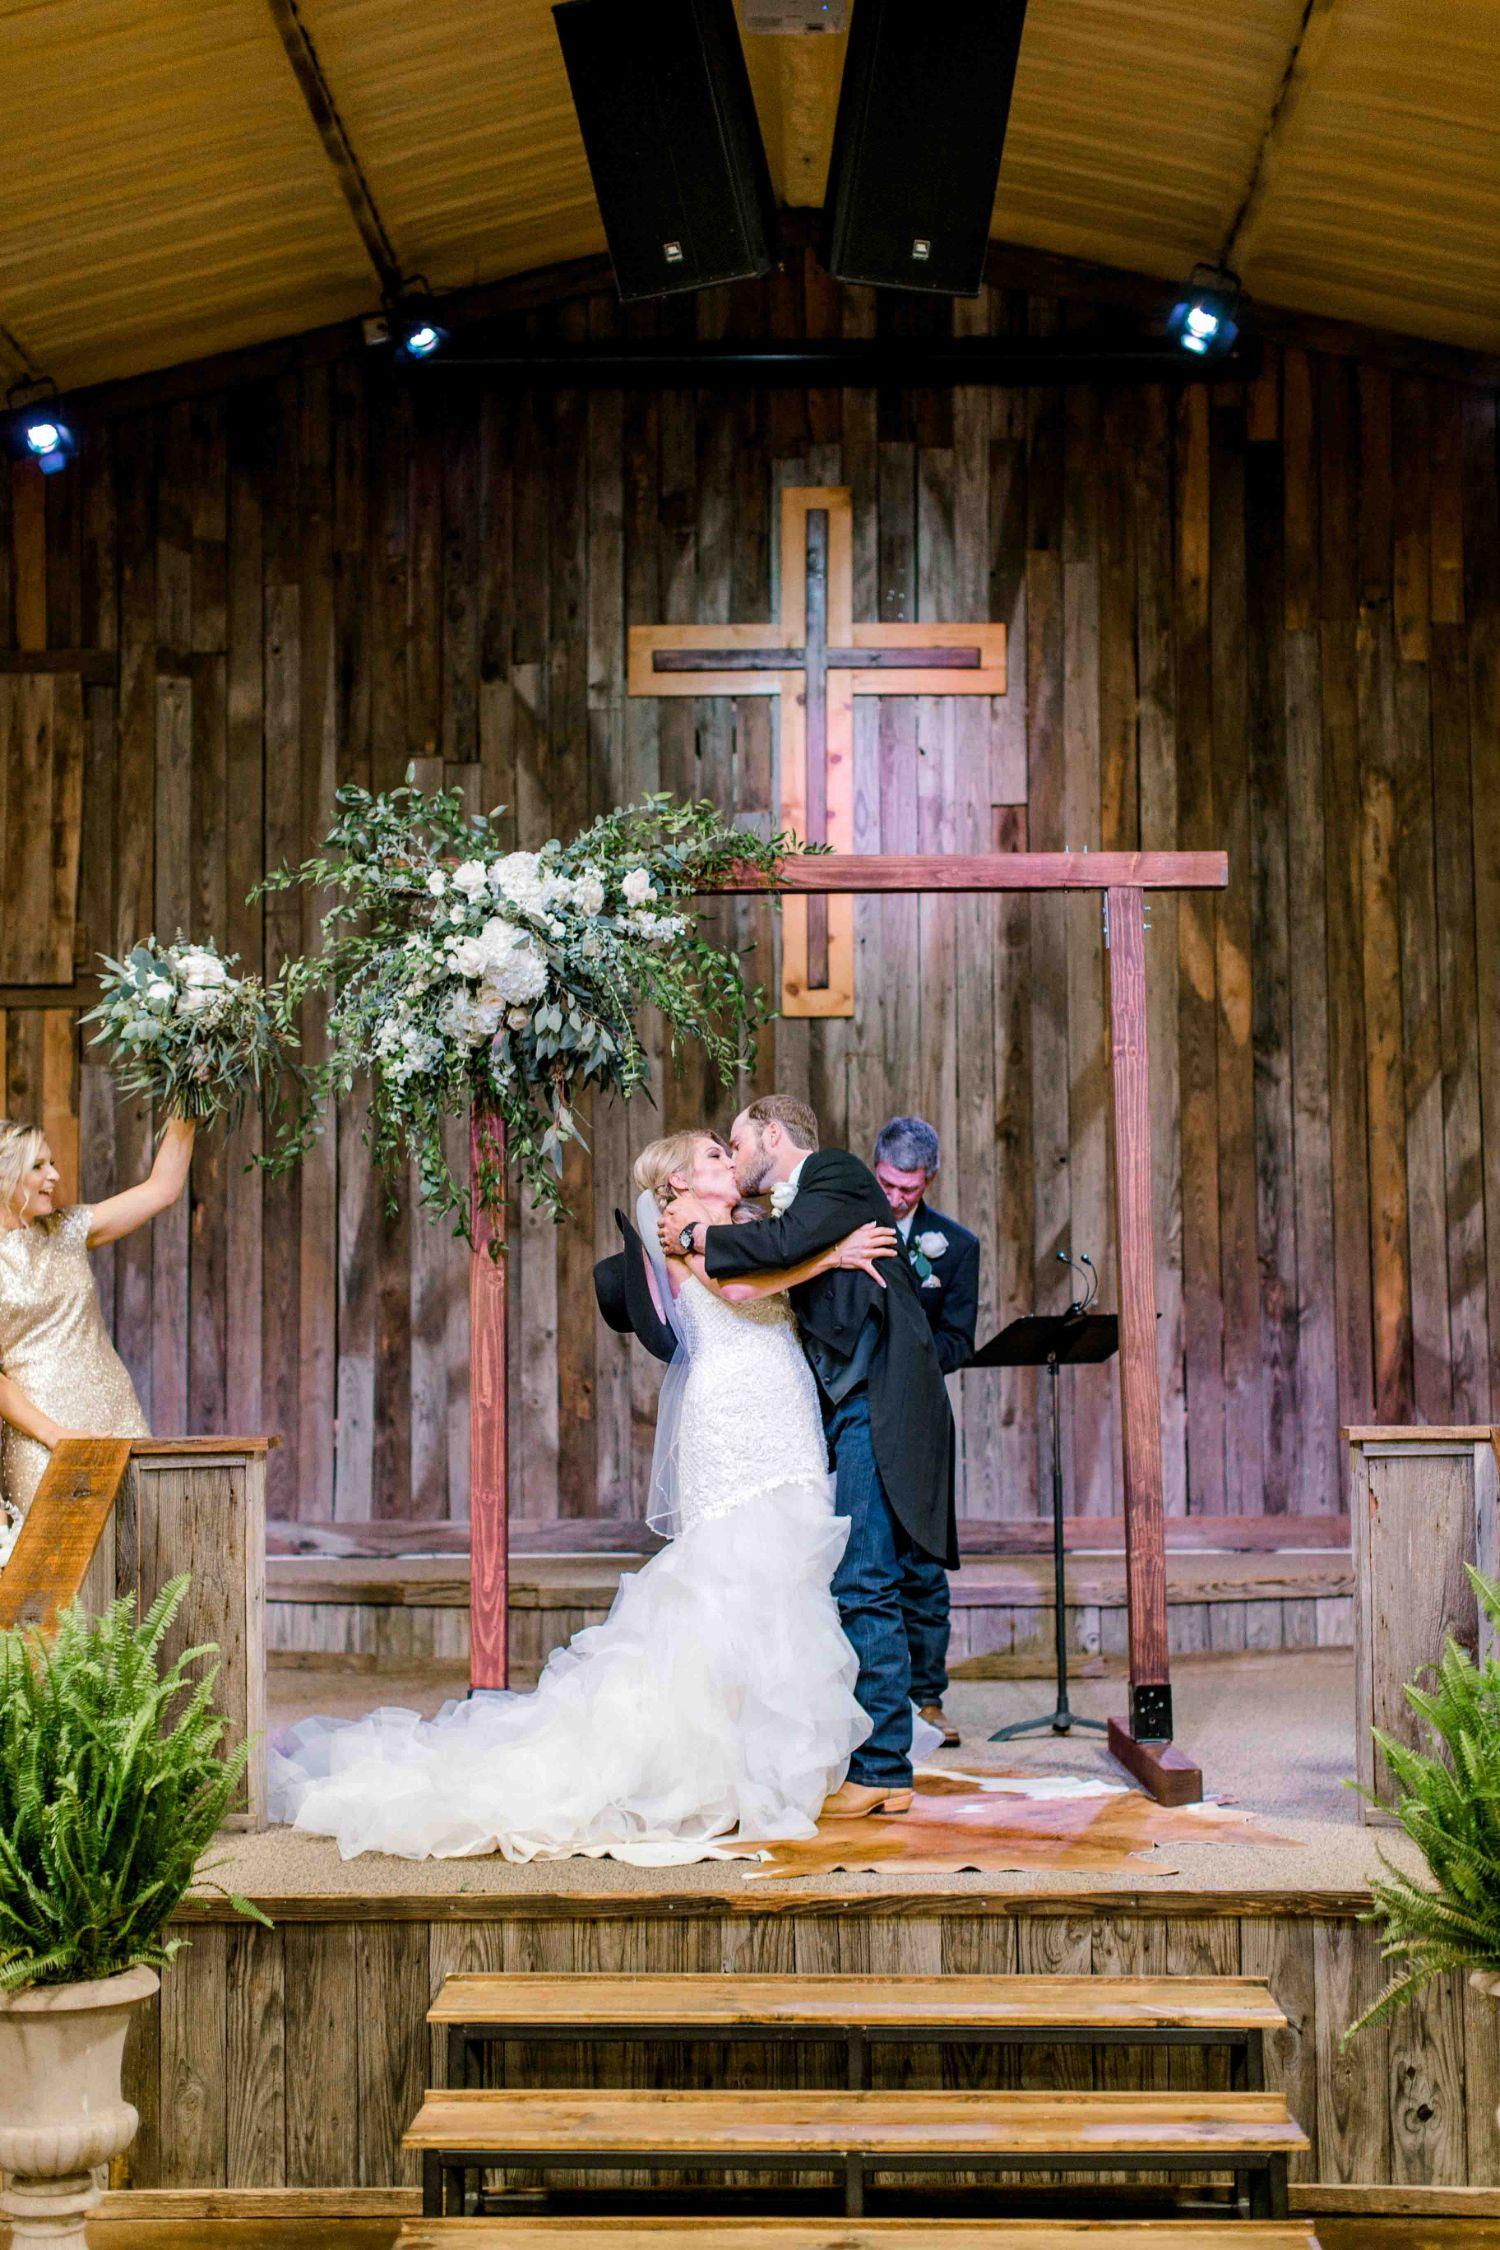 wichita-falls-wedding-katelyn-colten-vernon-texas-28.jpg